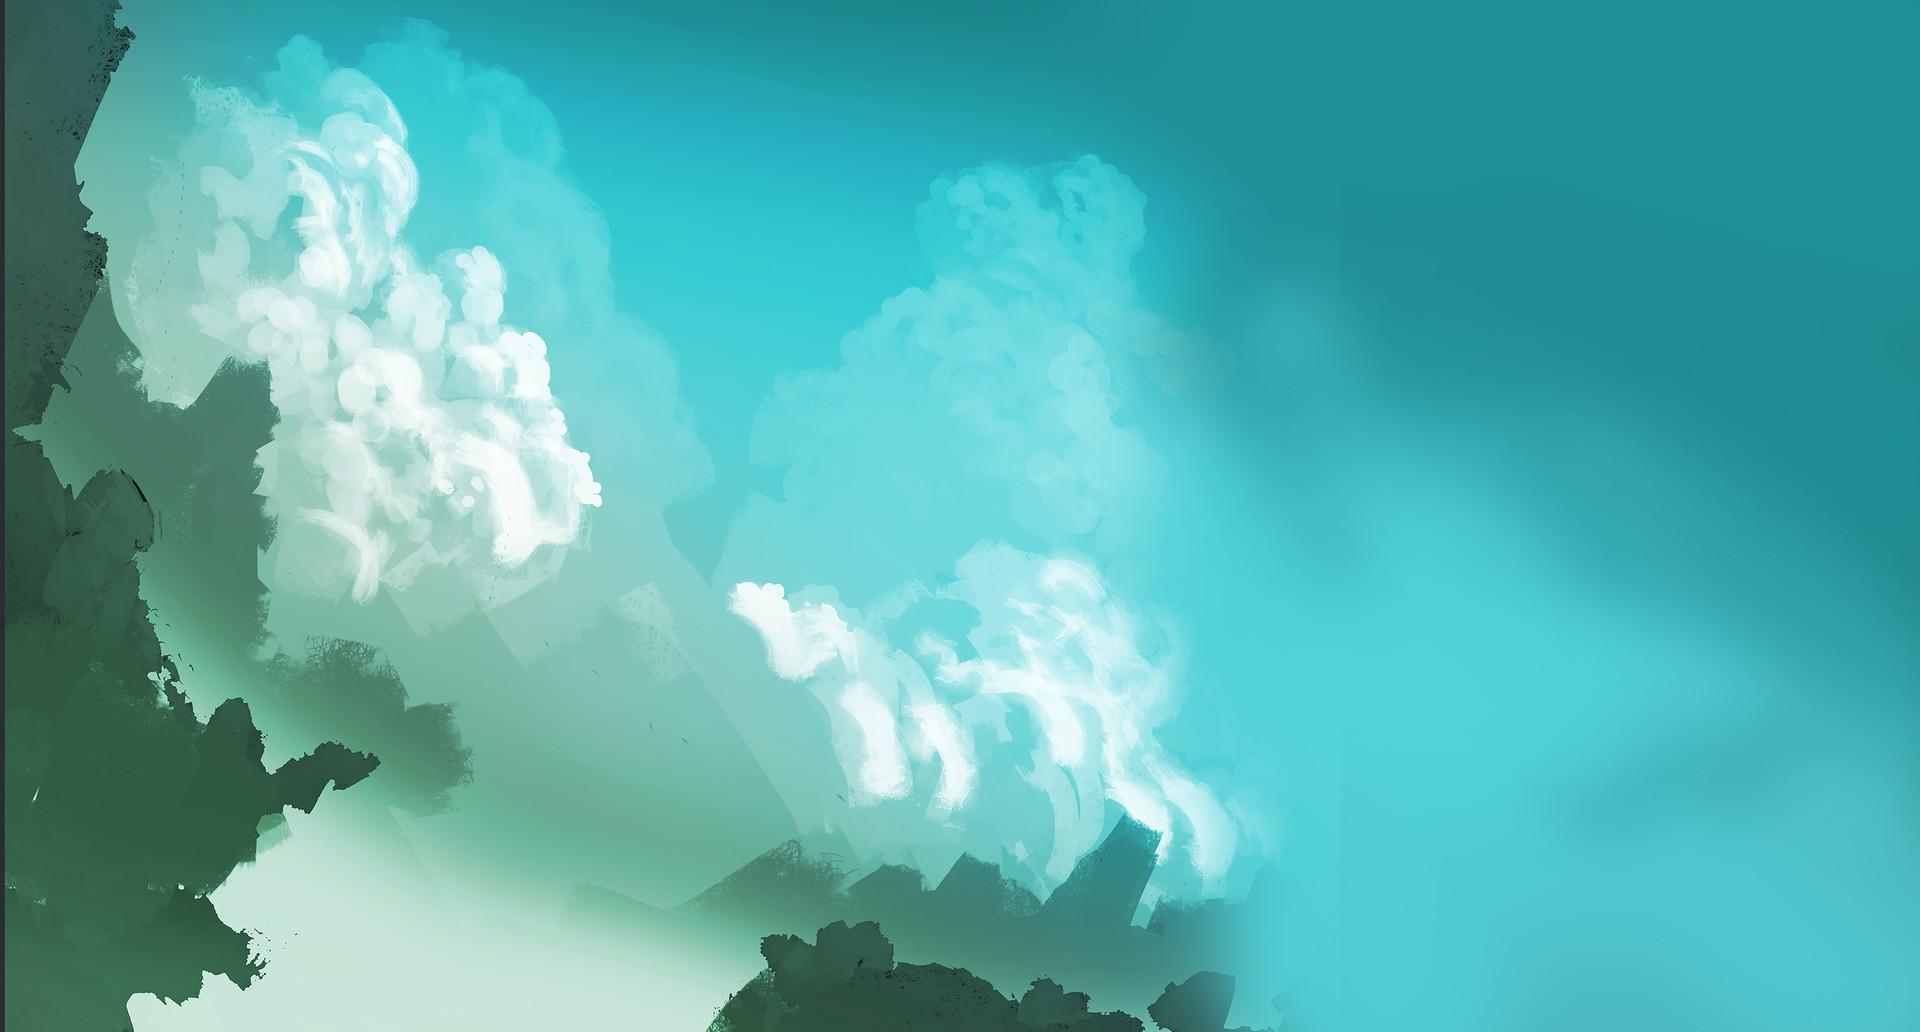 Francisco badilla floyd dragon sketch bueno 1